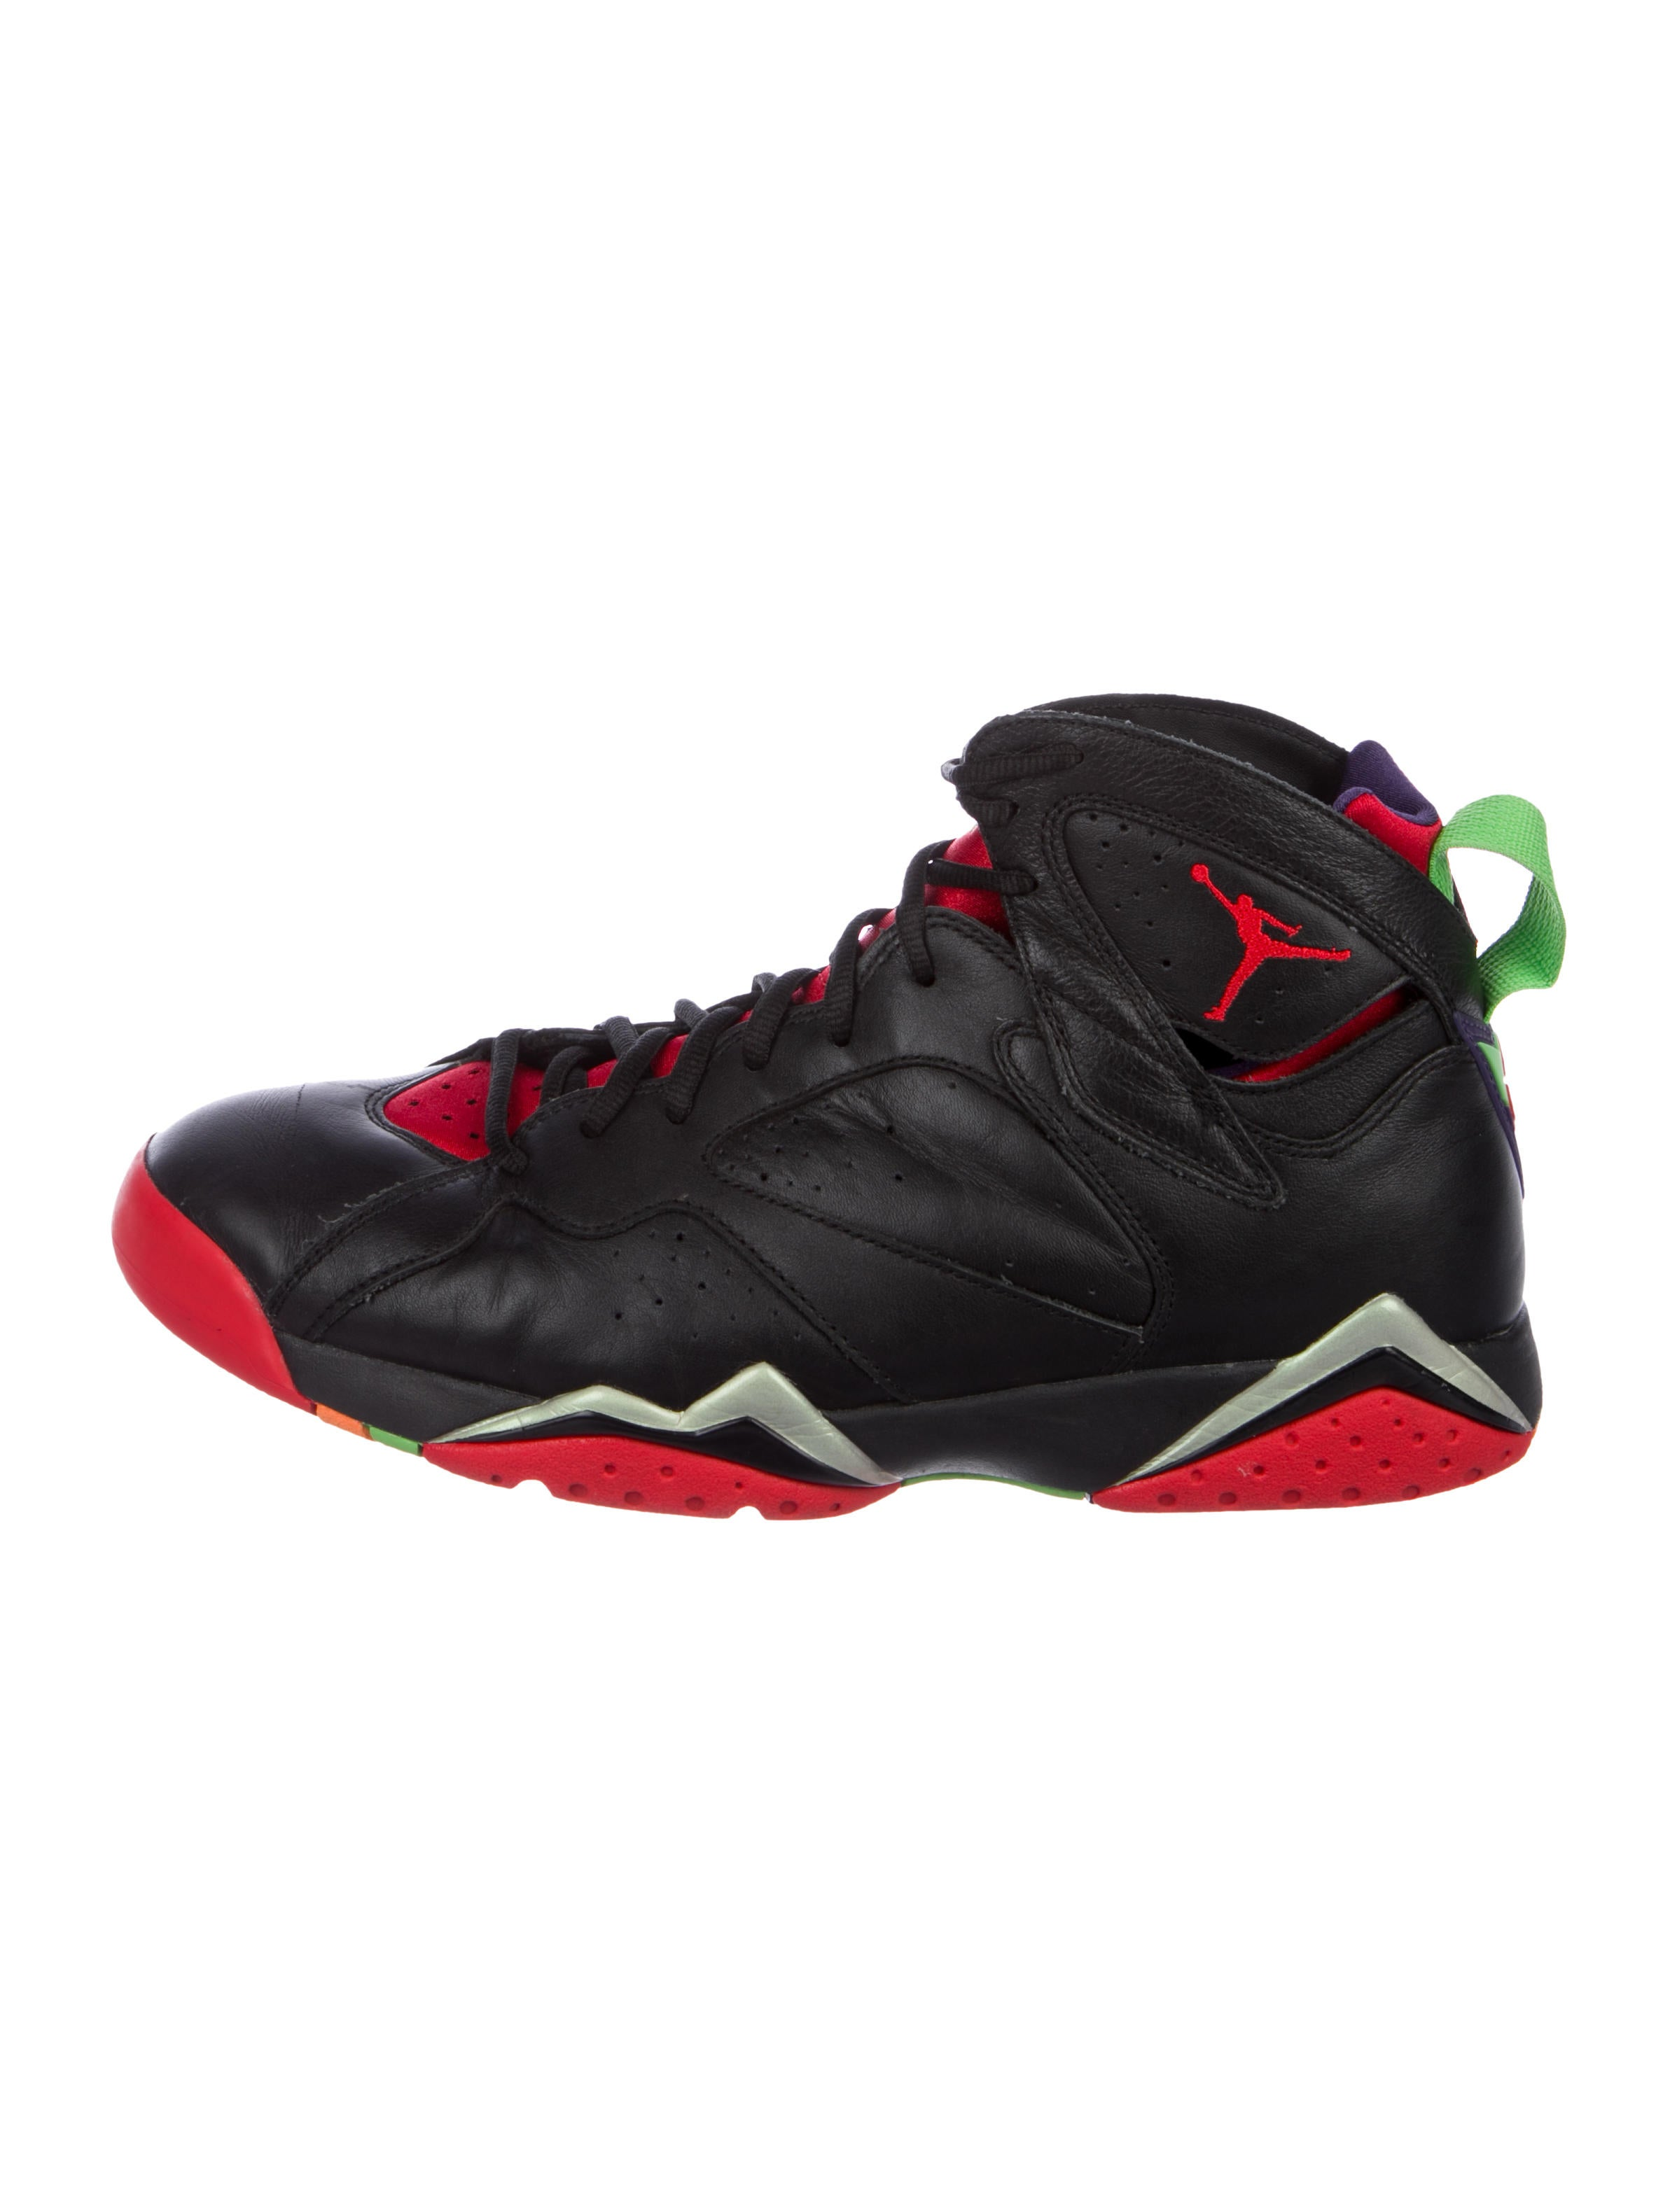 76c72cc8020 Nike Air Jordan 7 Retro Marvin The Martian Sneakers - Shoes ...